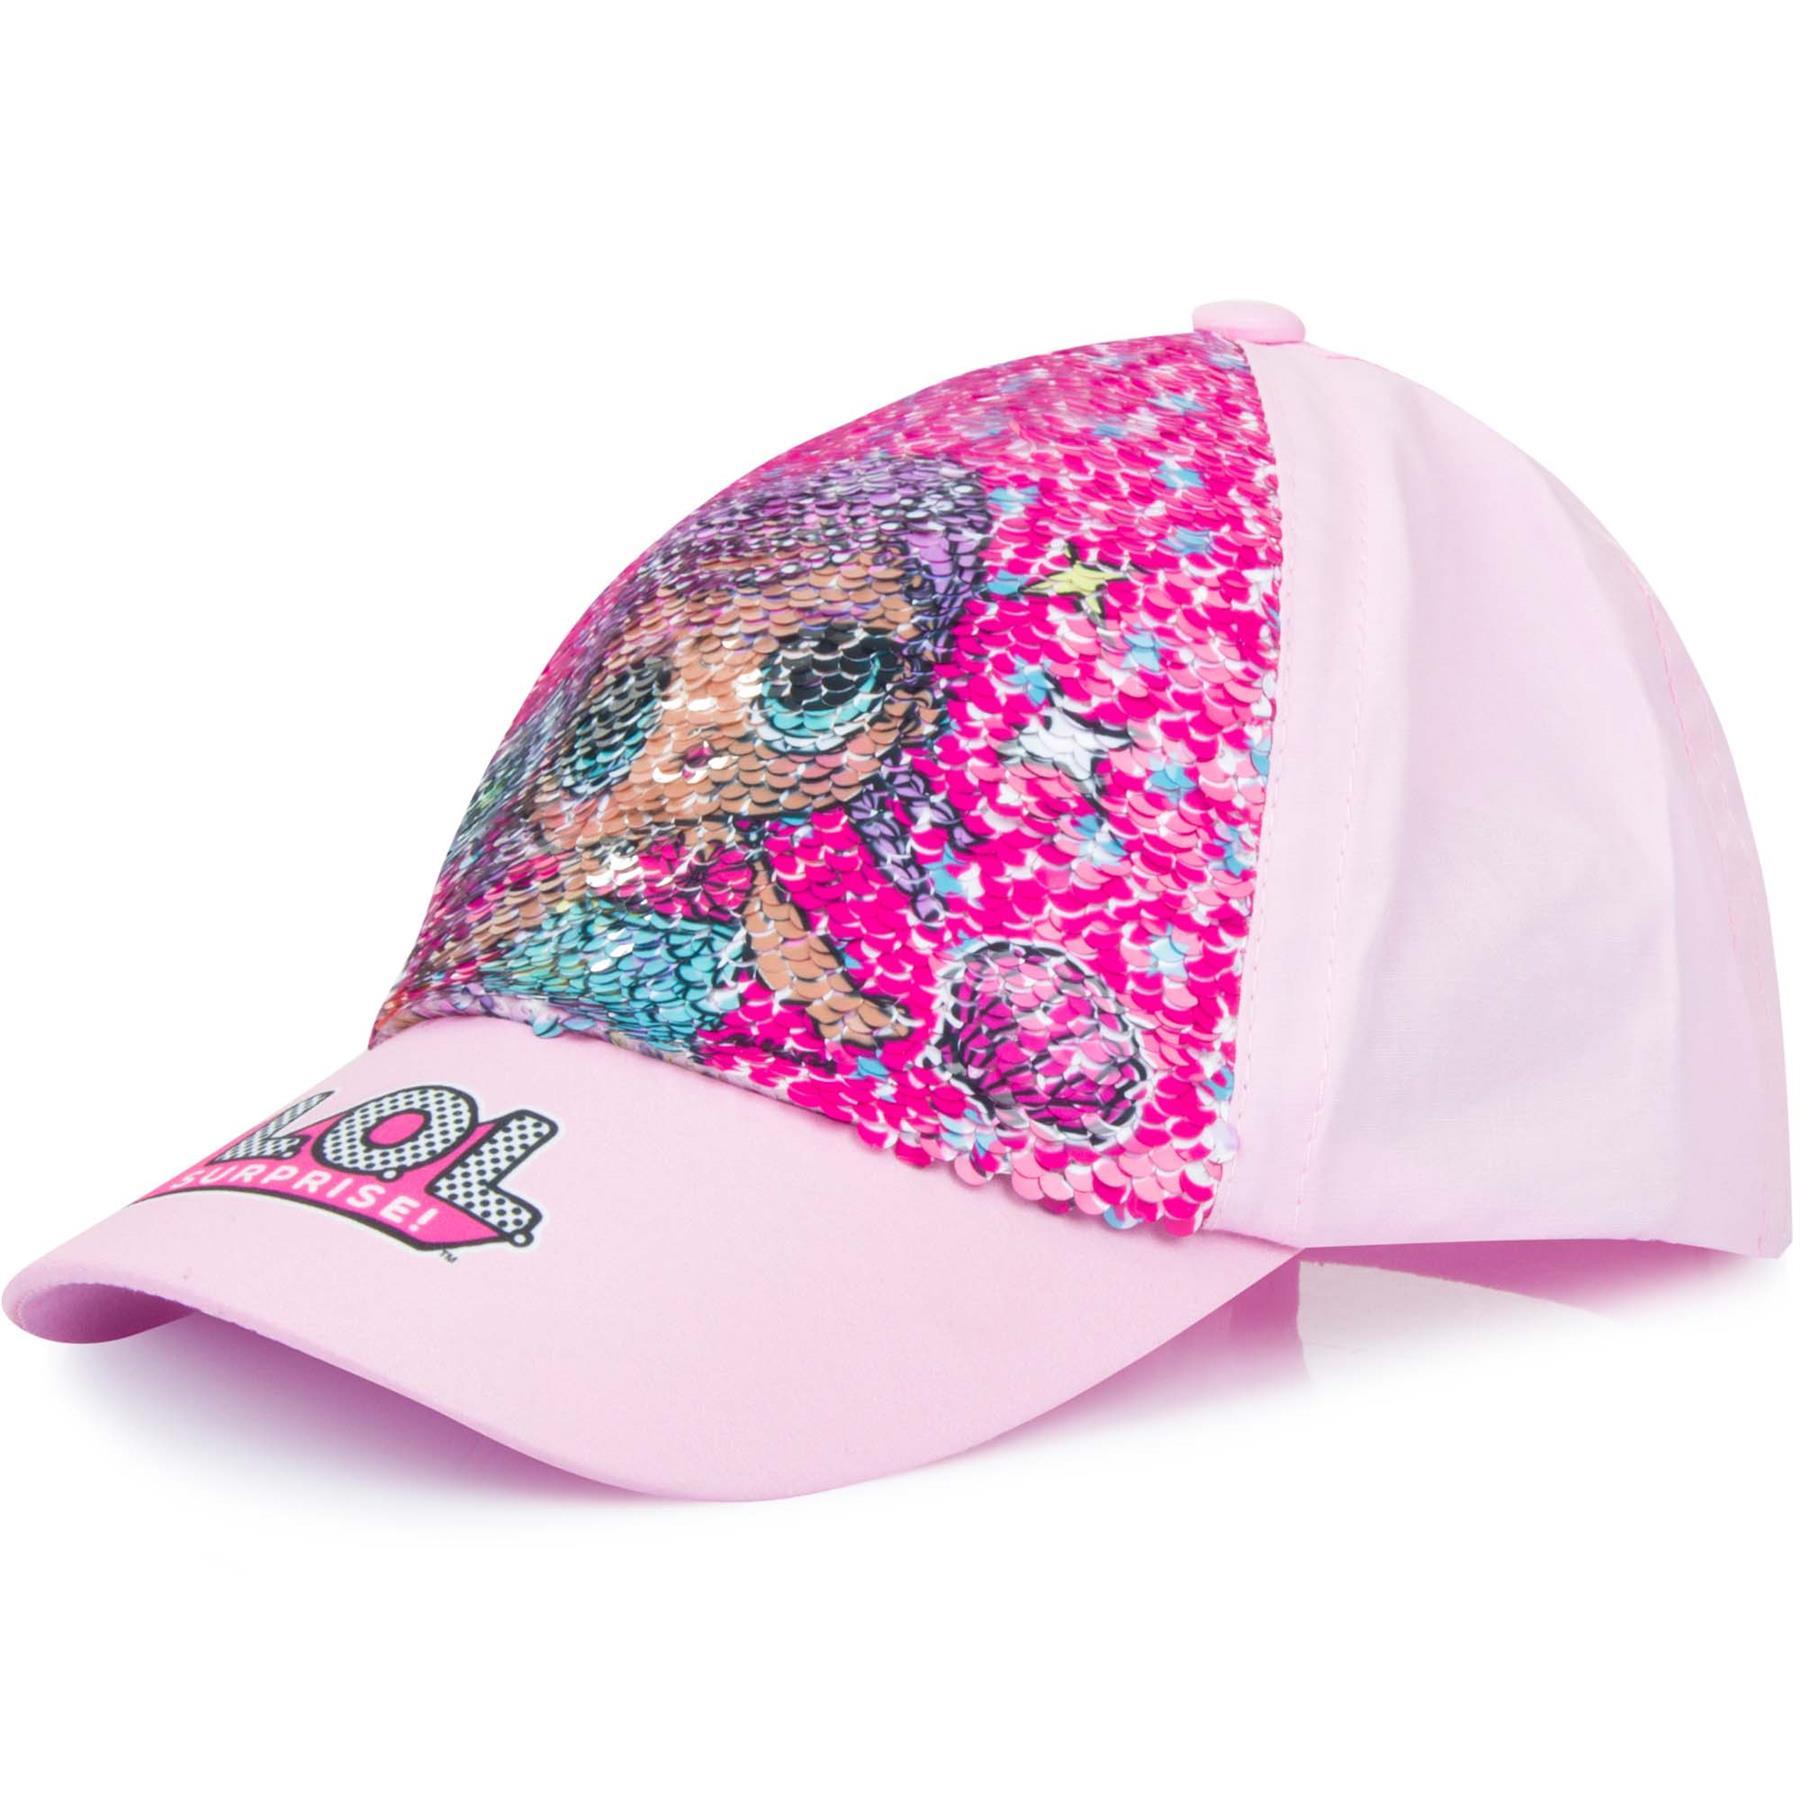 Girls-Cap-LOL-Surprise-Baseball-Reversible-Pink-Sequin-Hat-Sun-Summer thumbnail 6